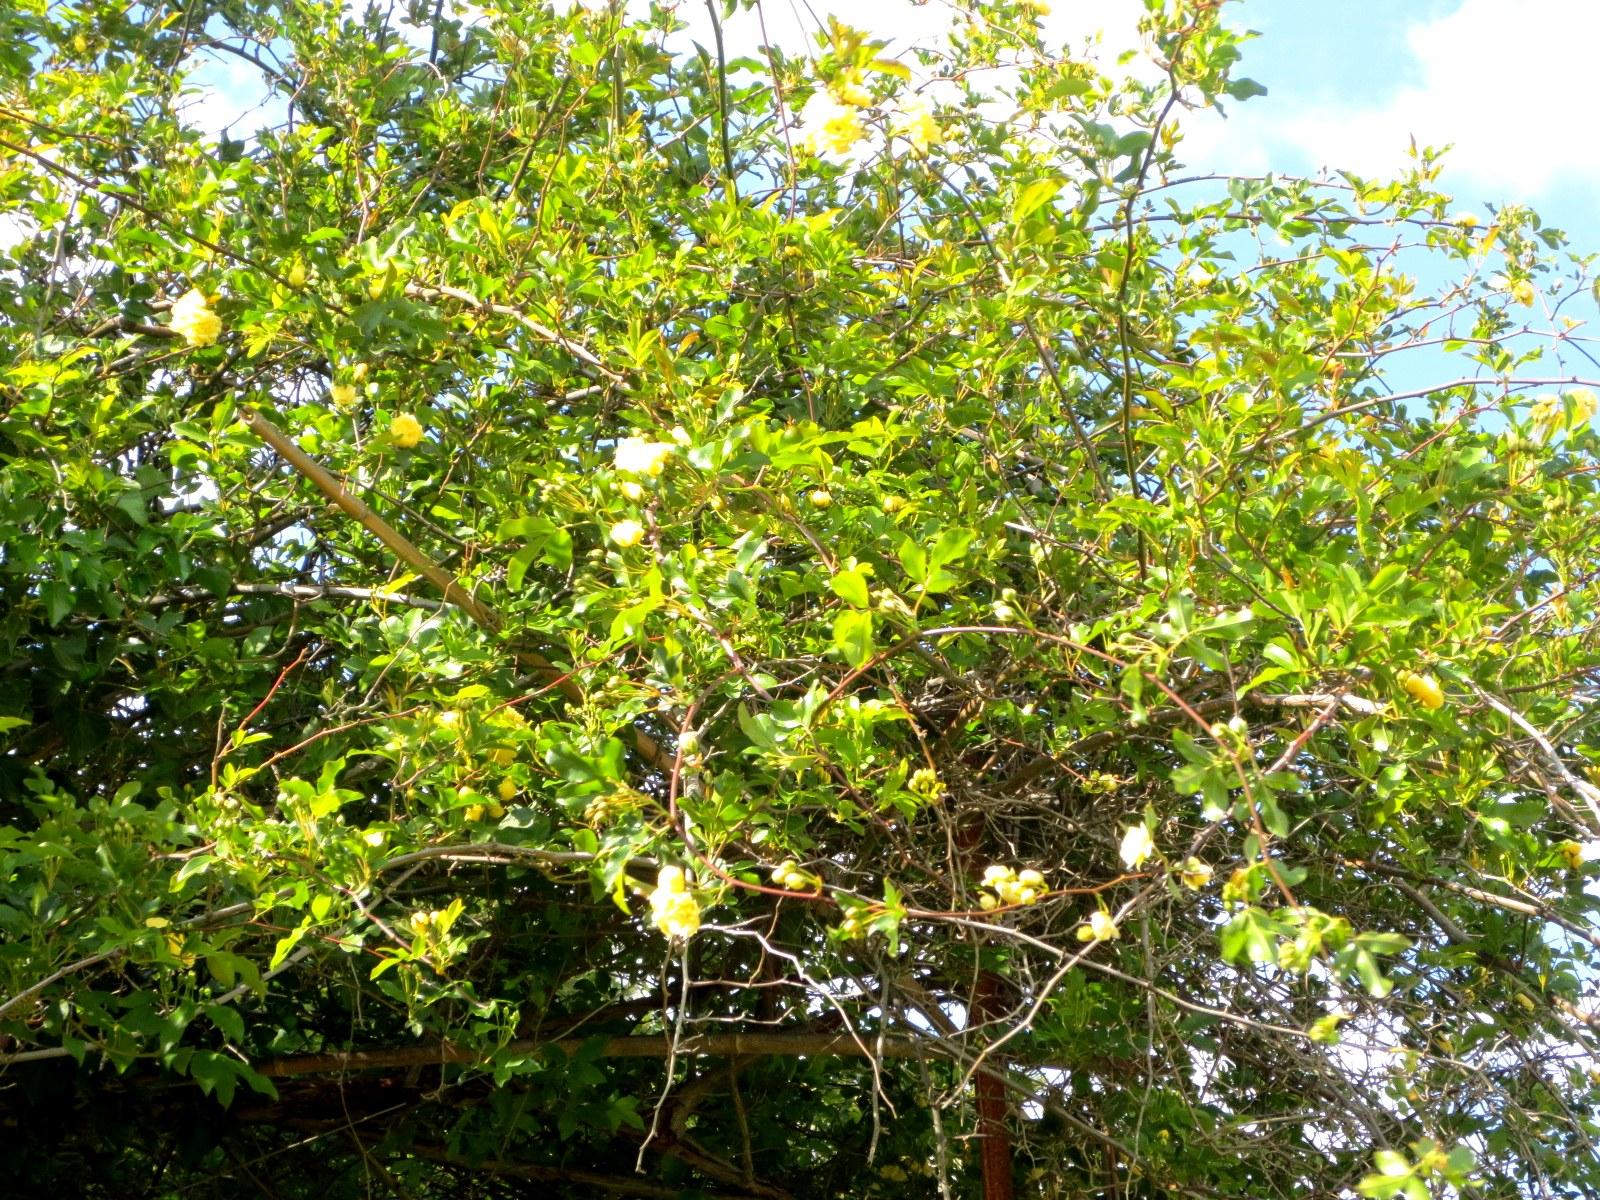 Jardin avril 2016 fleurs de cerisier tara for Jardin d aywiers 2016